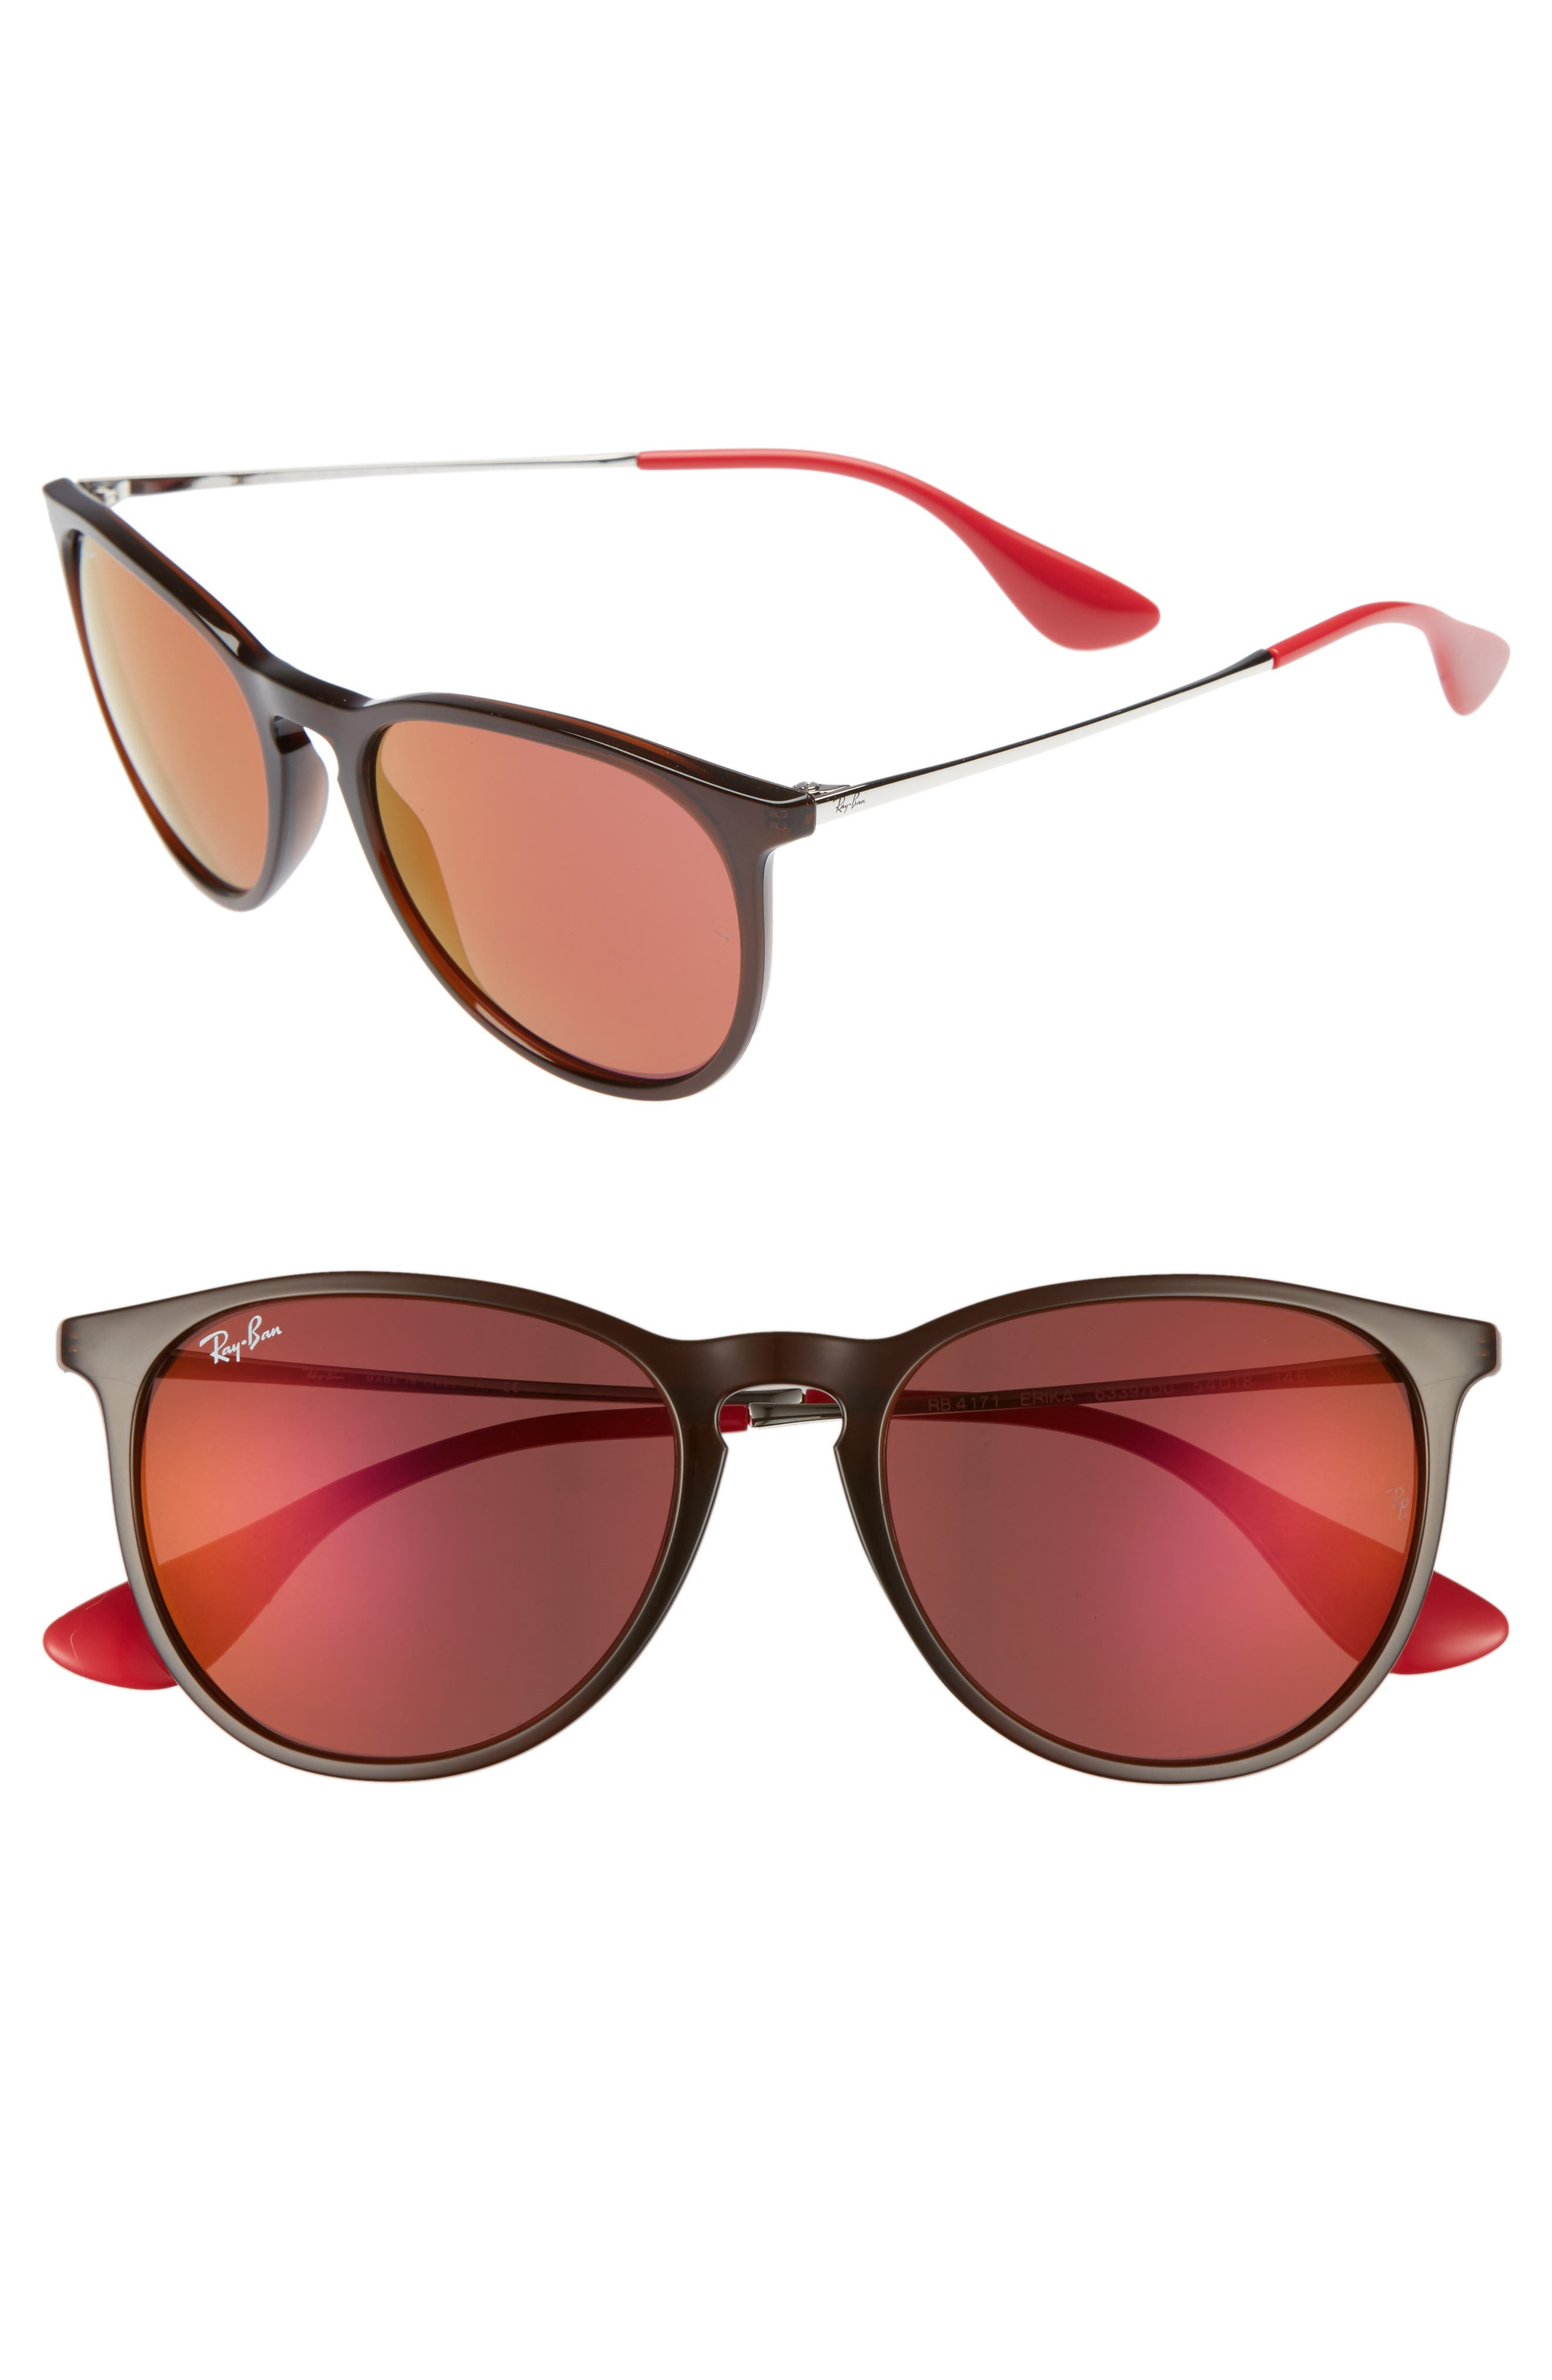 Erika Classic 54mm Sunglasses,                             Main thumbnail 1, color,                             203